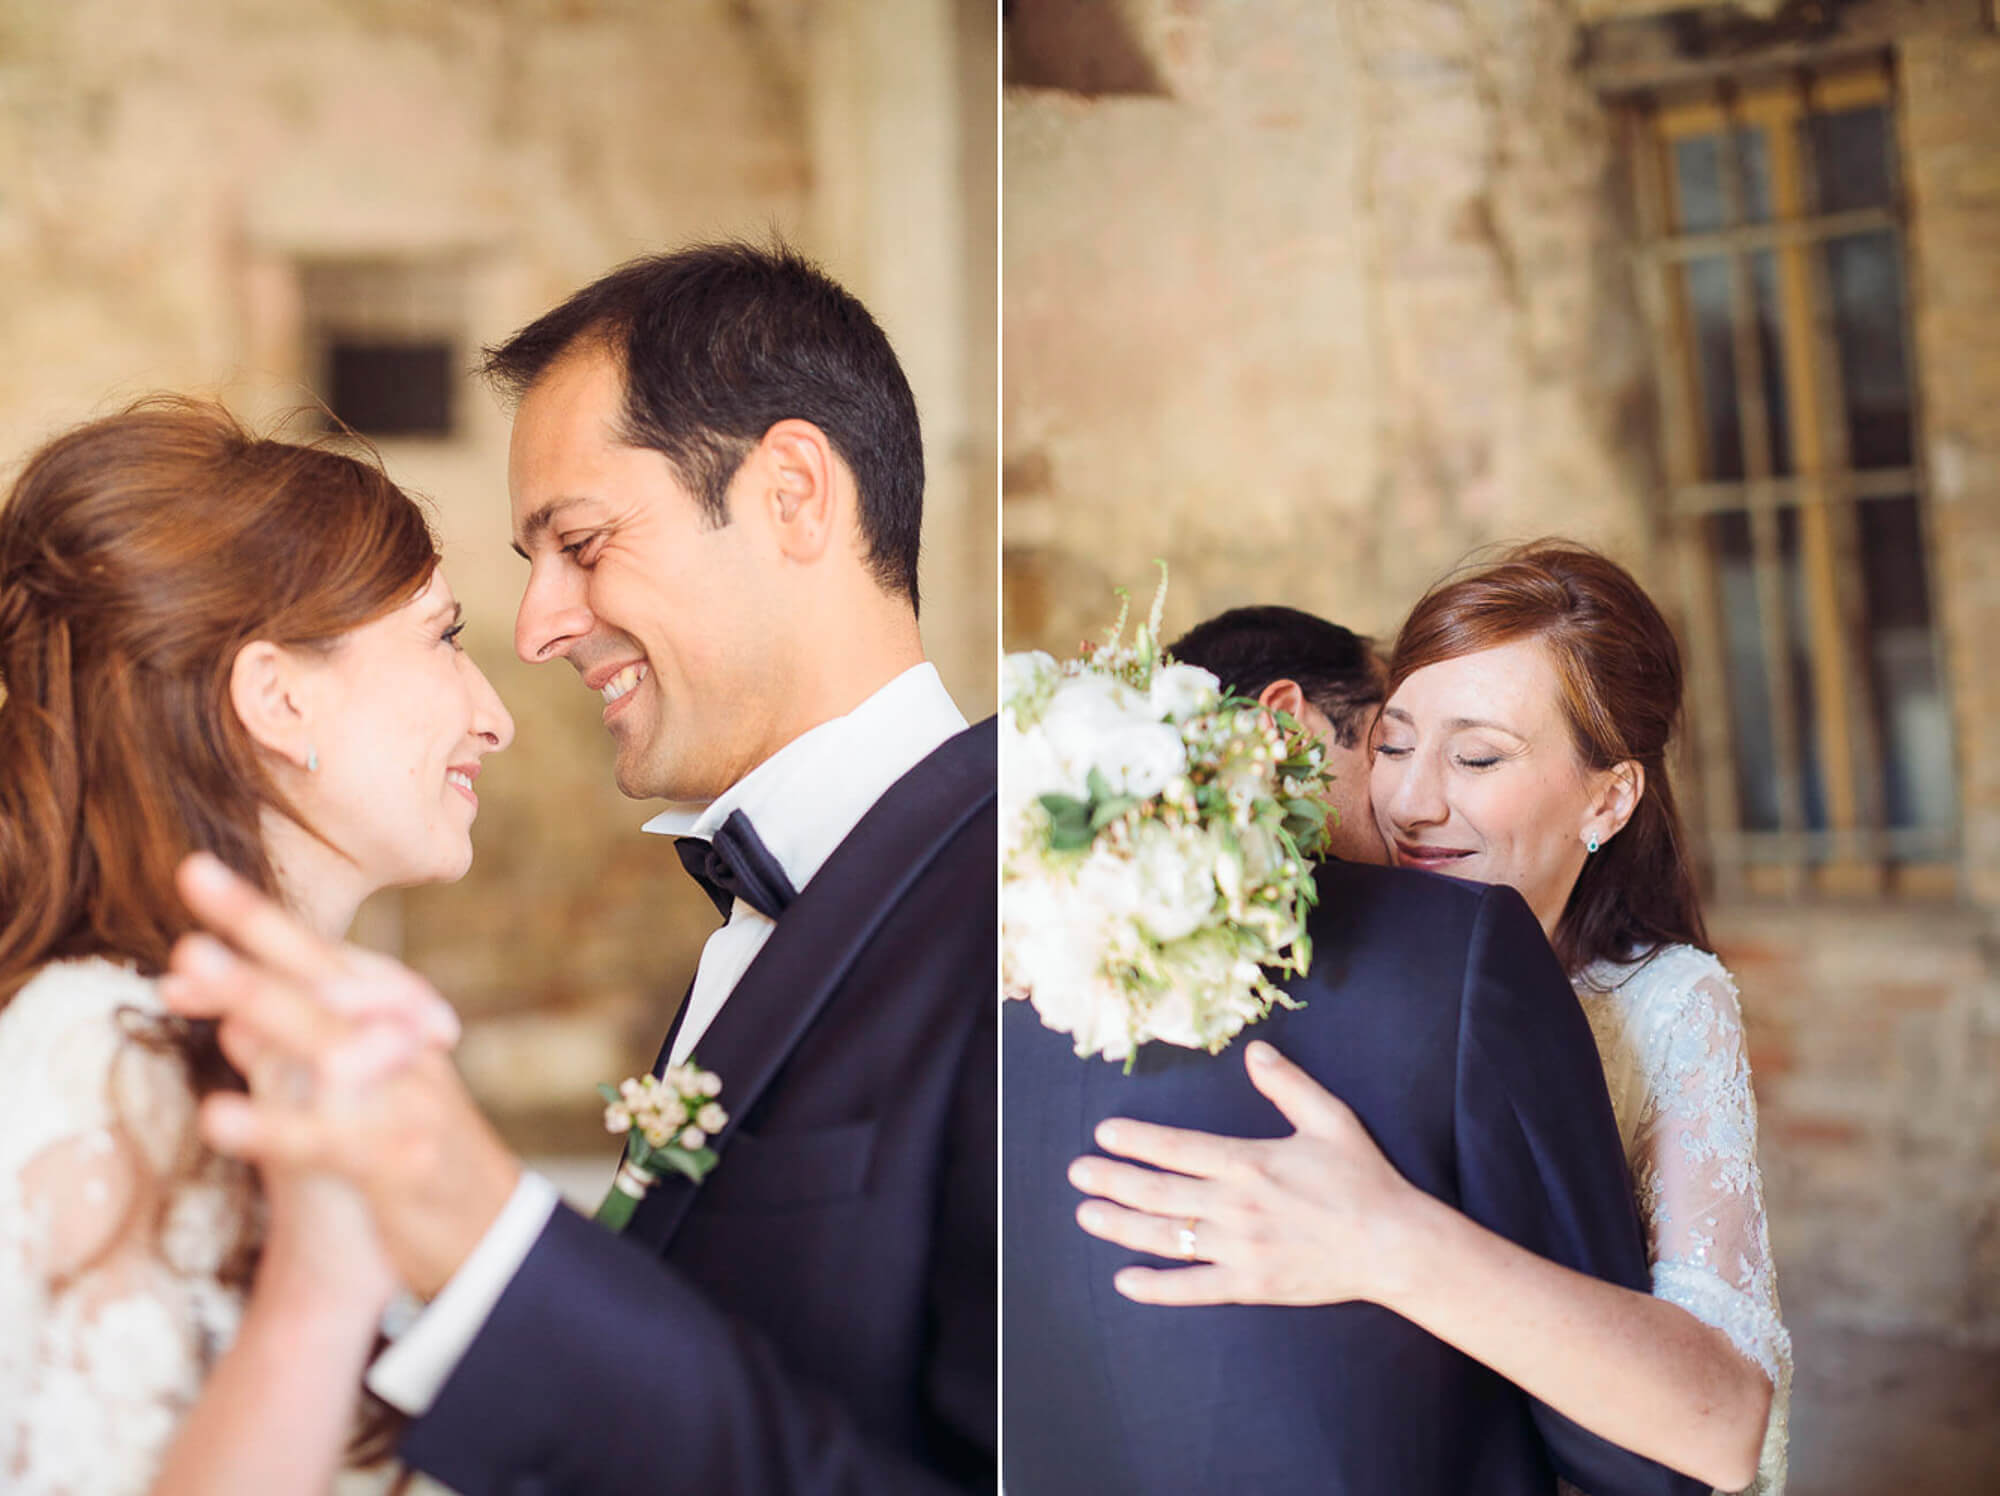 92_destination wedding creative portait photographer.jpg